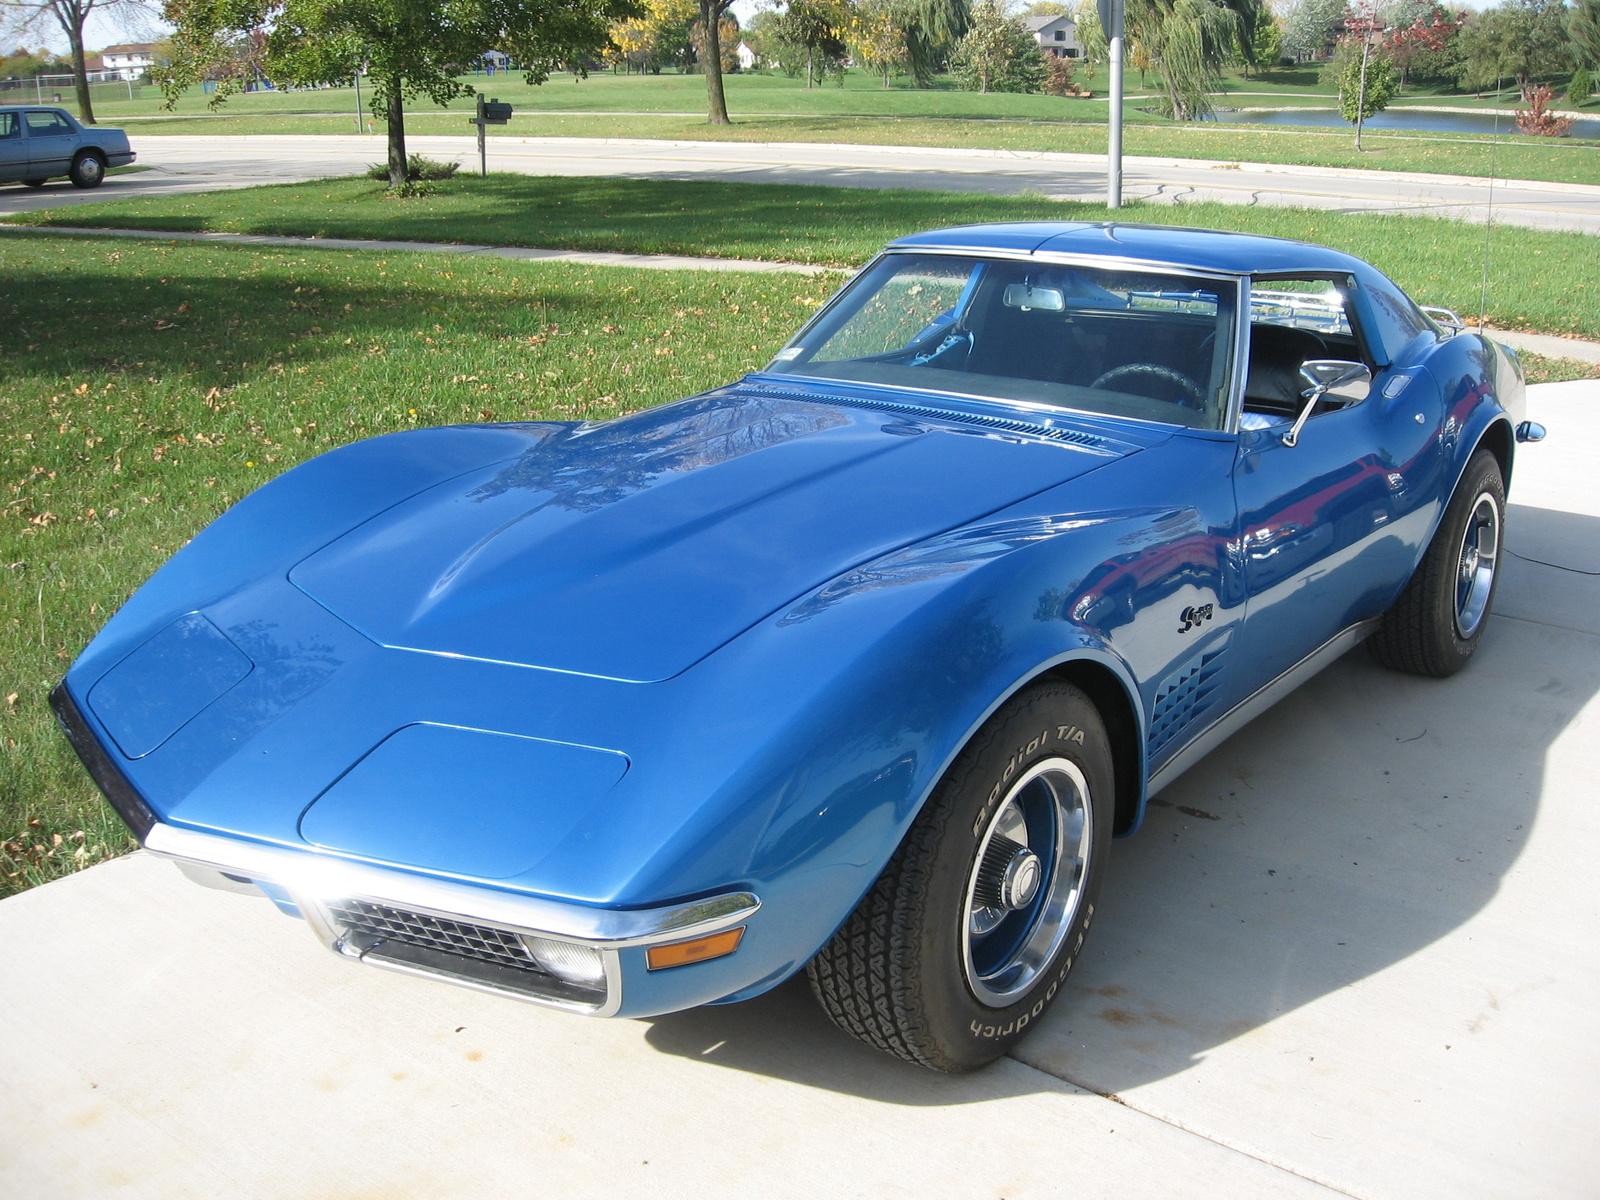 1970 Chevrolet Corvette Coupe picture, exterior